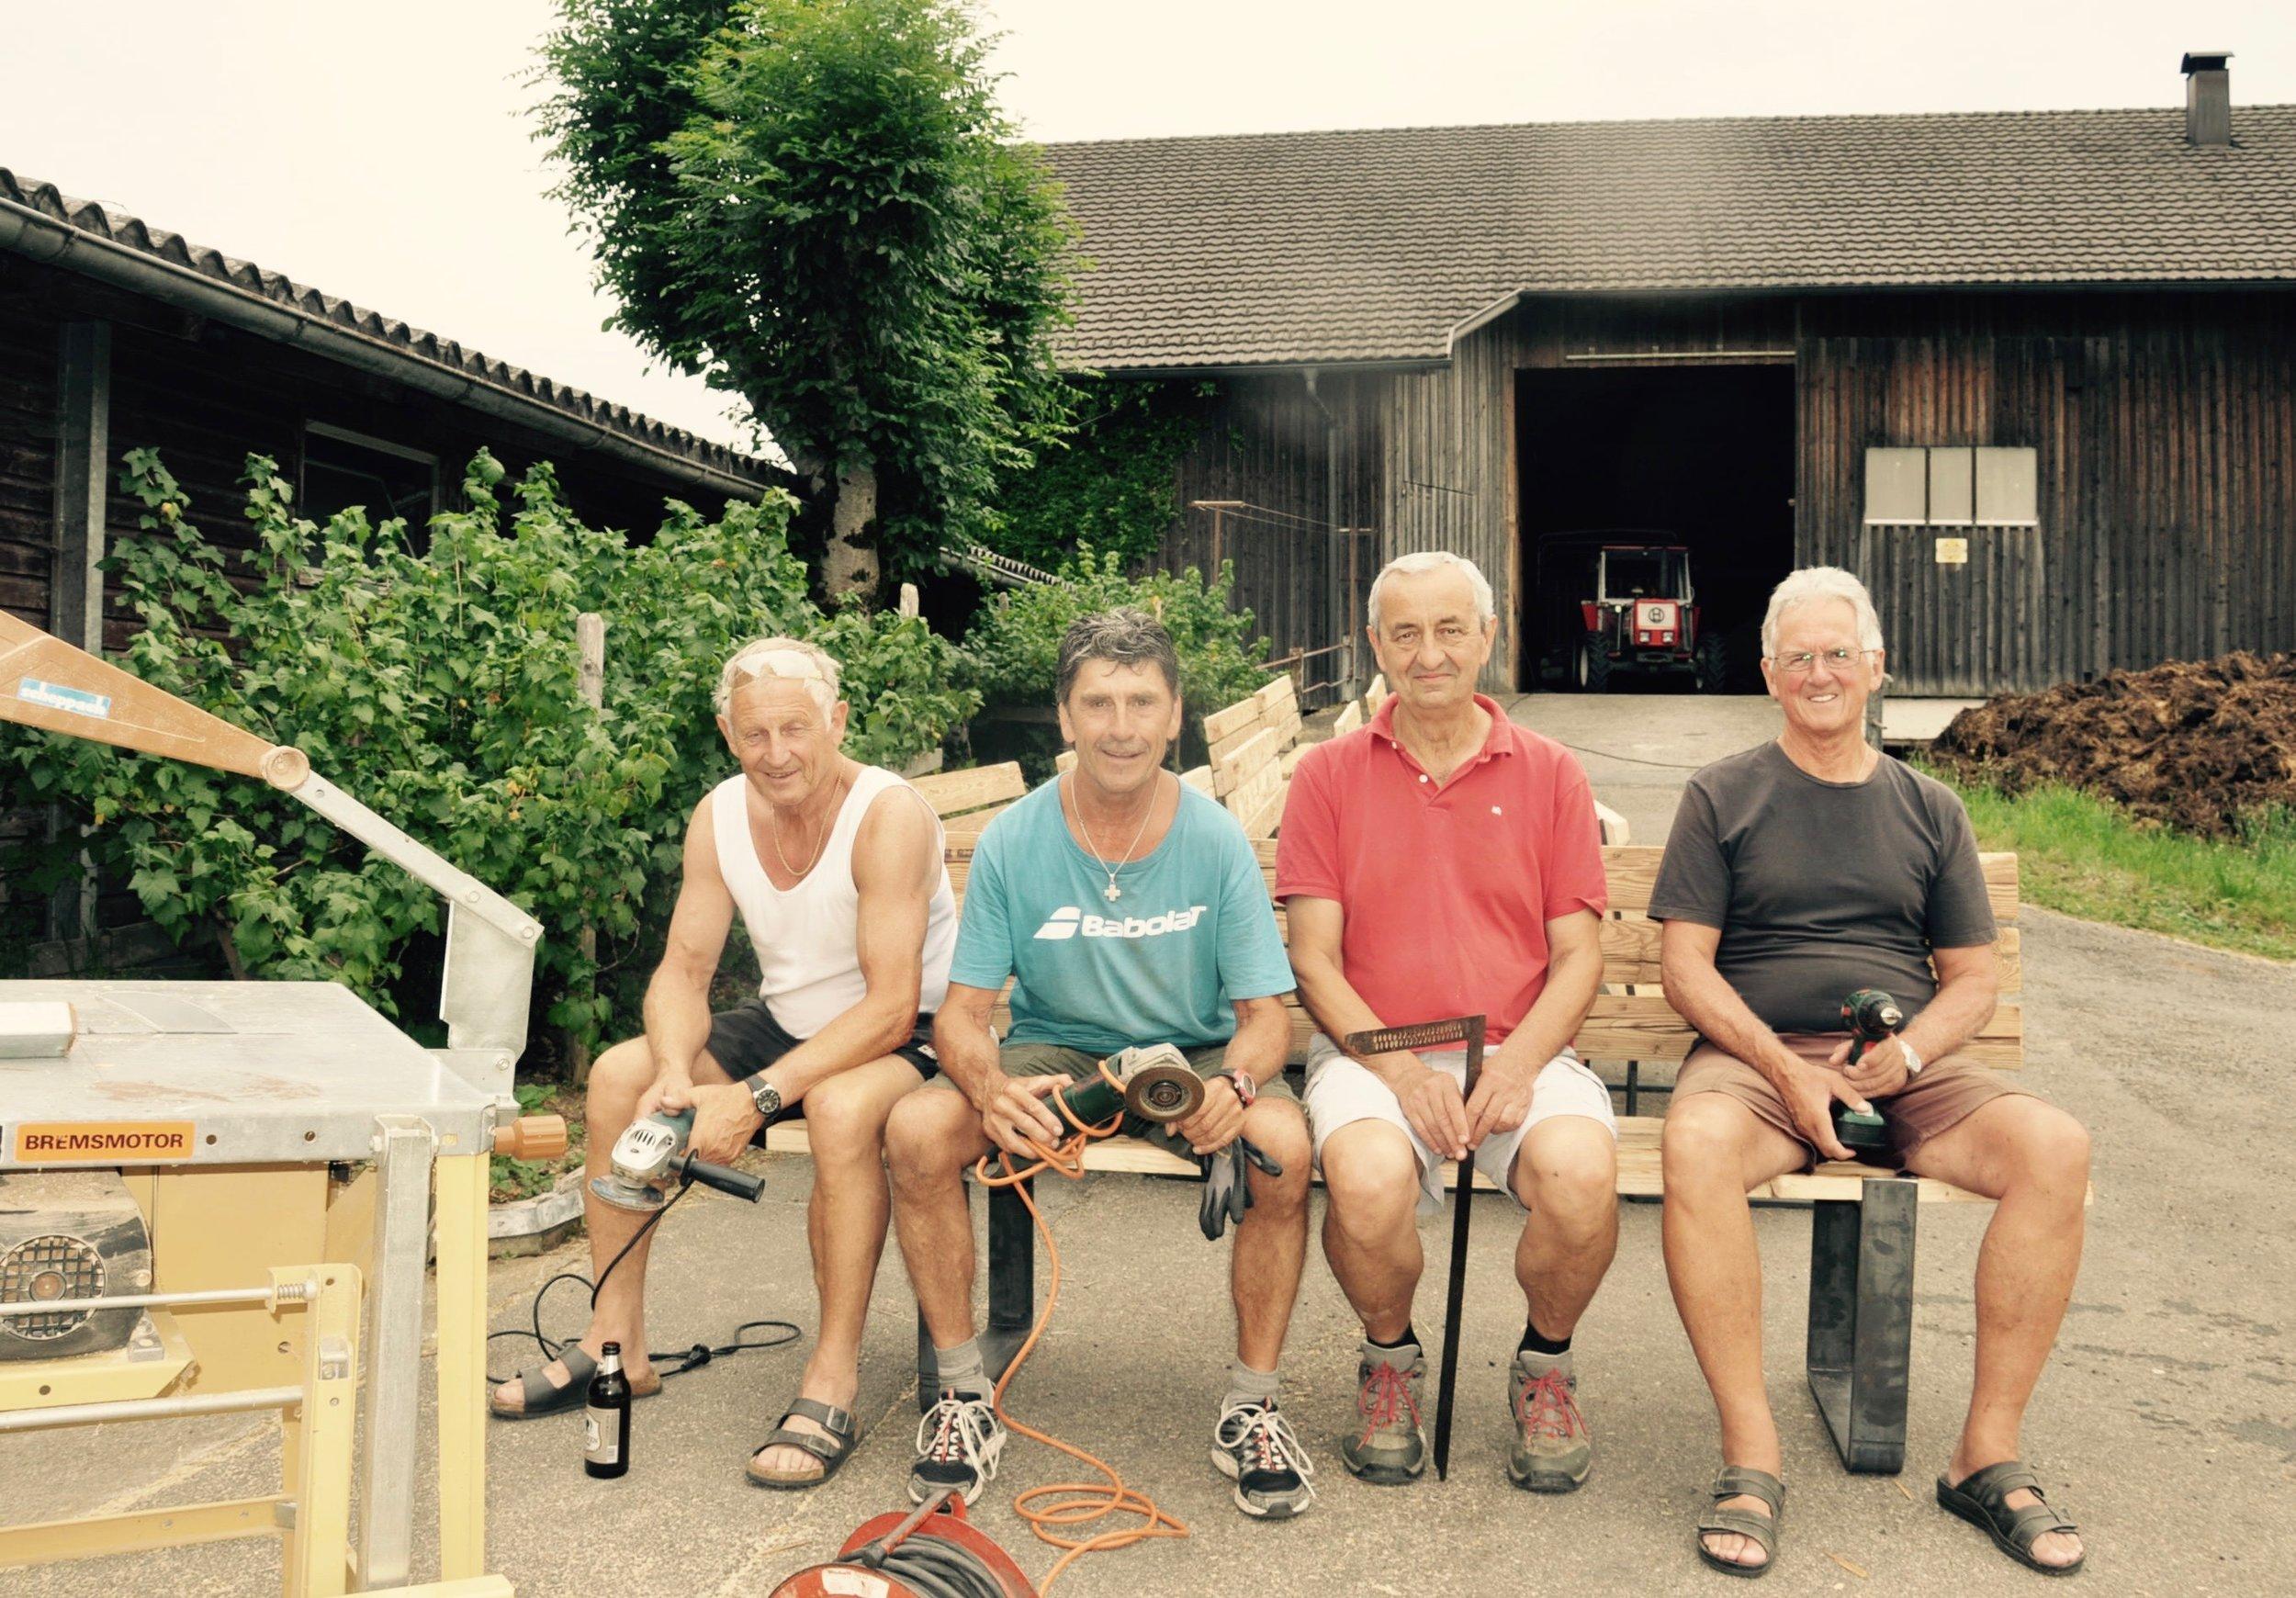 v.l.n.r.: Gerhard Lipburger, Josef Meusburger, Klaus Riedl, Konrad Lipburger